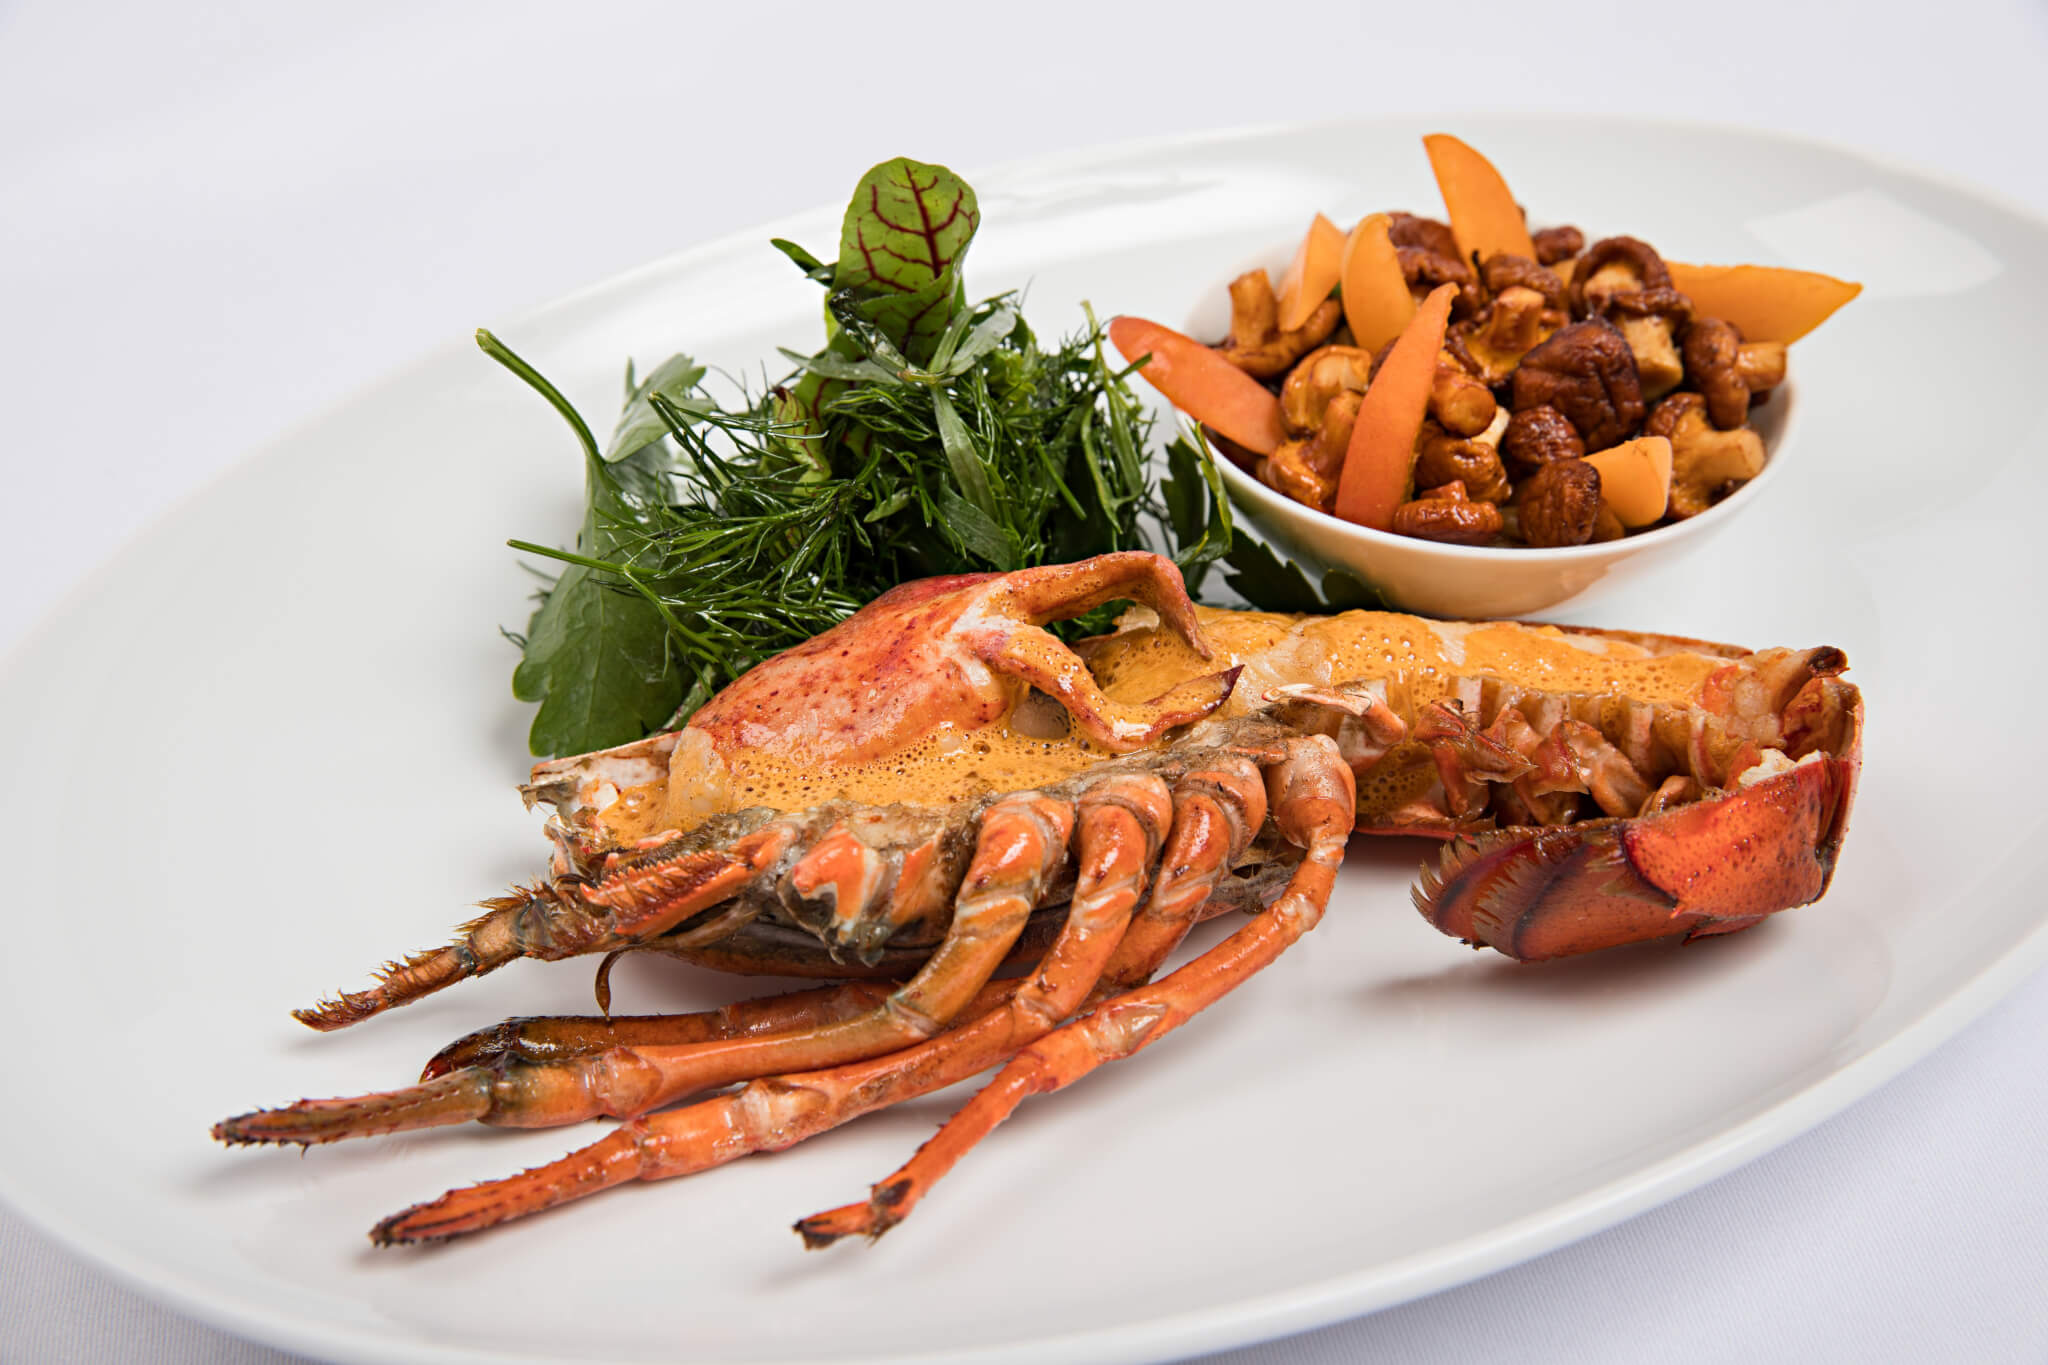 Lobster menu at the restaurant Duke – a tip!